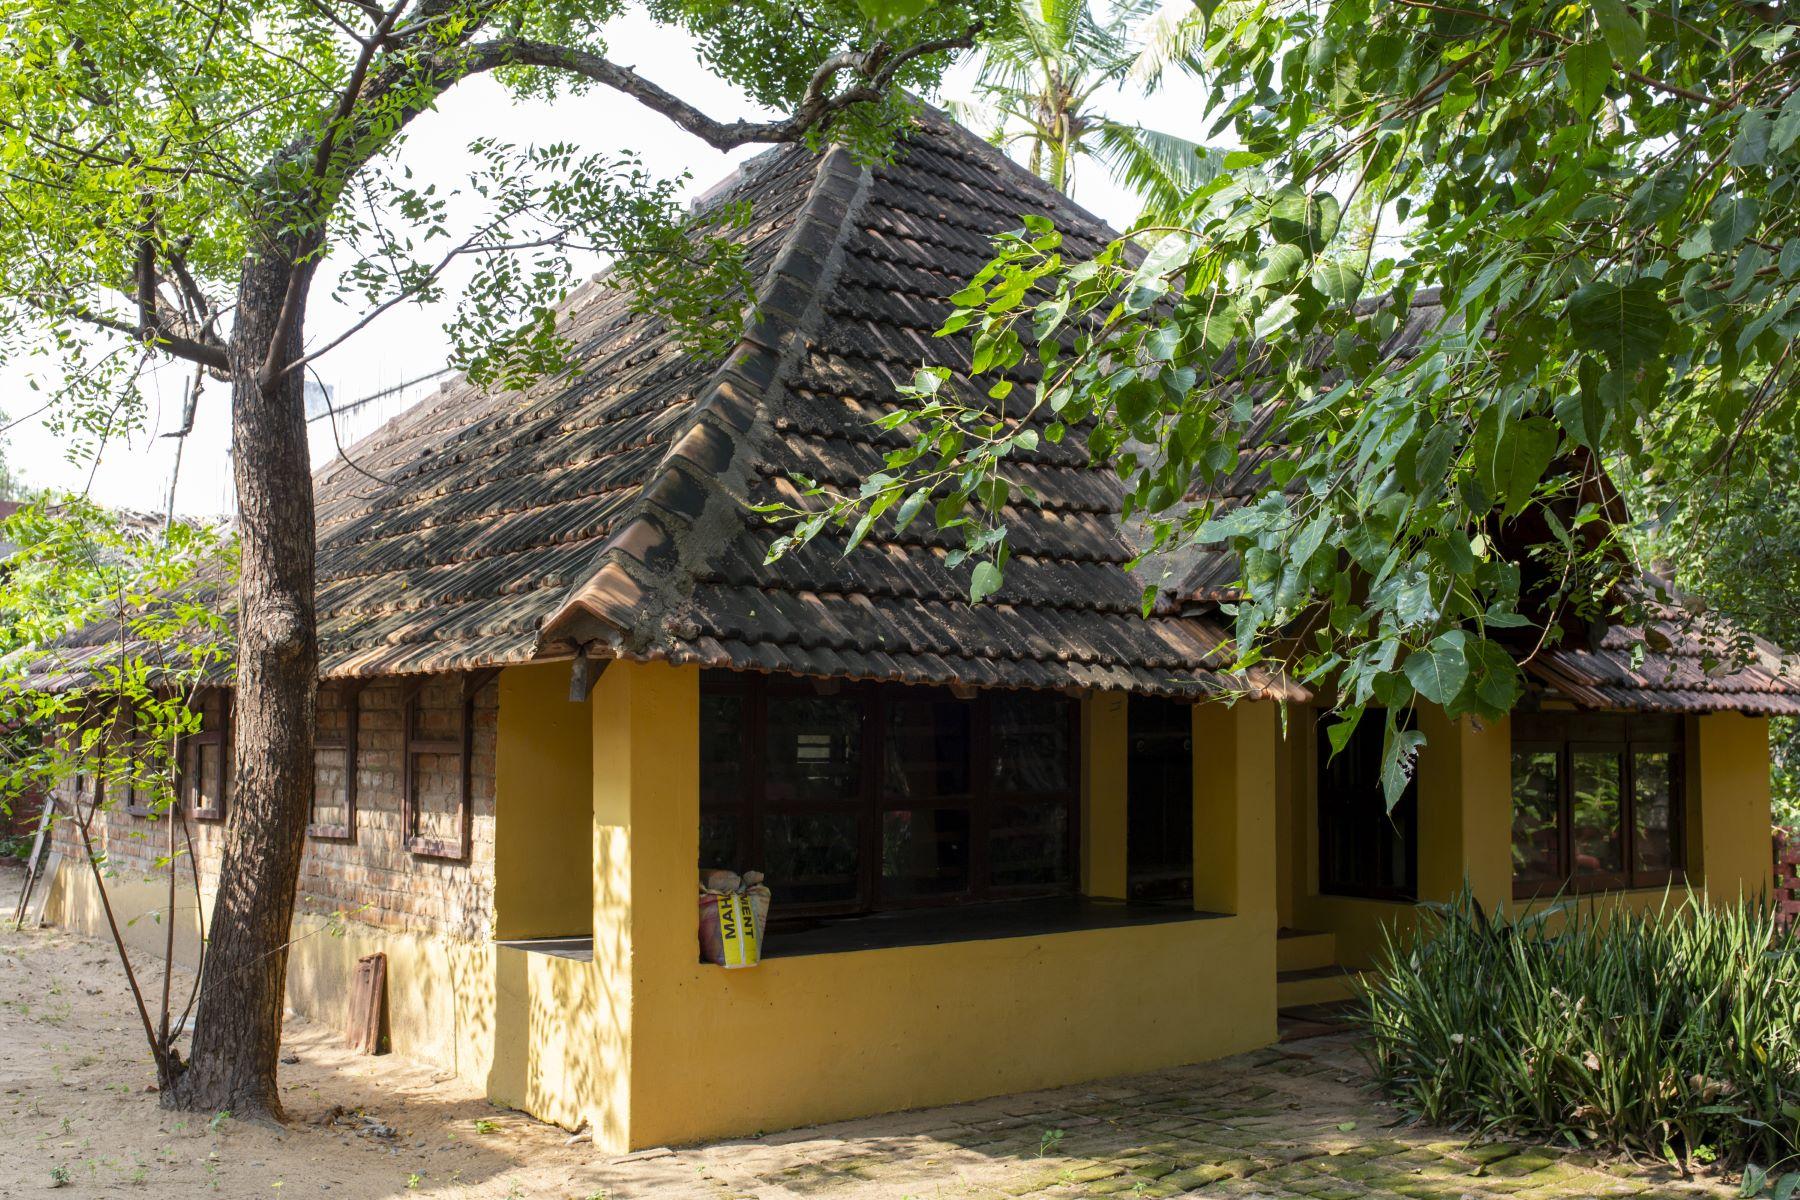 Artist Velu Viswanadhan's house